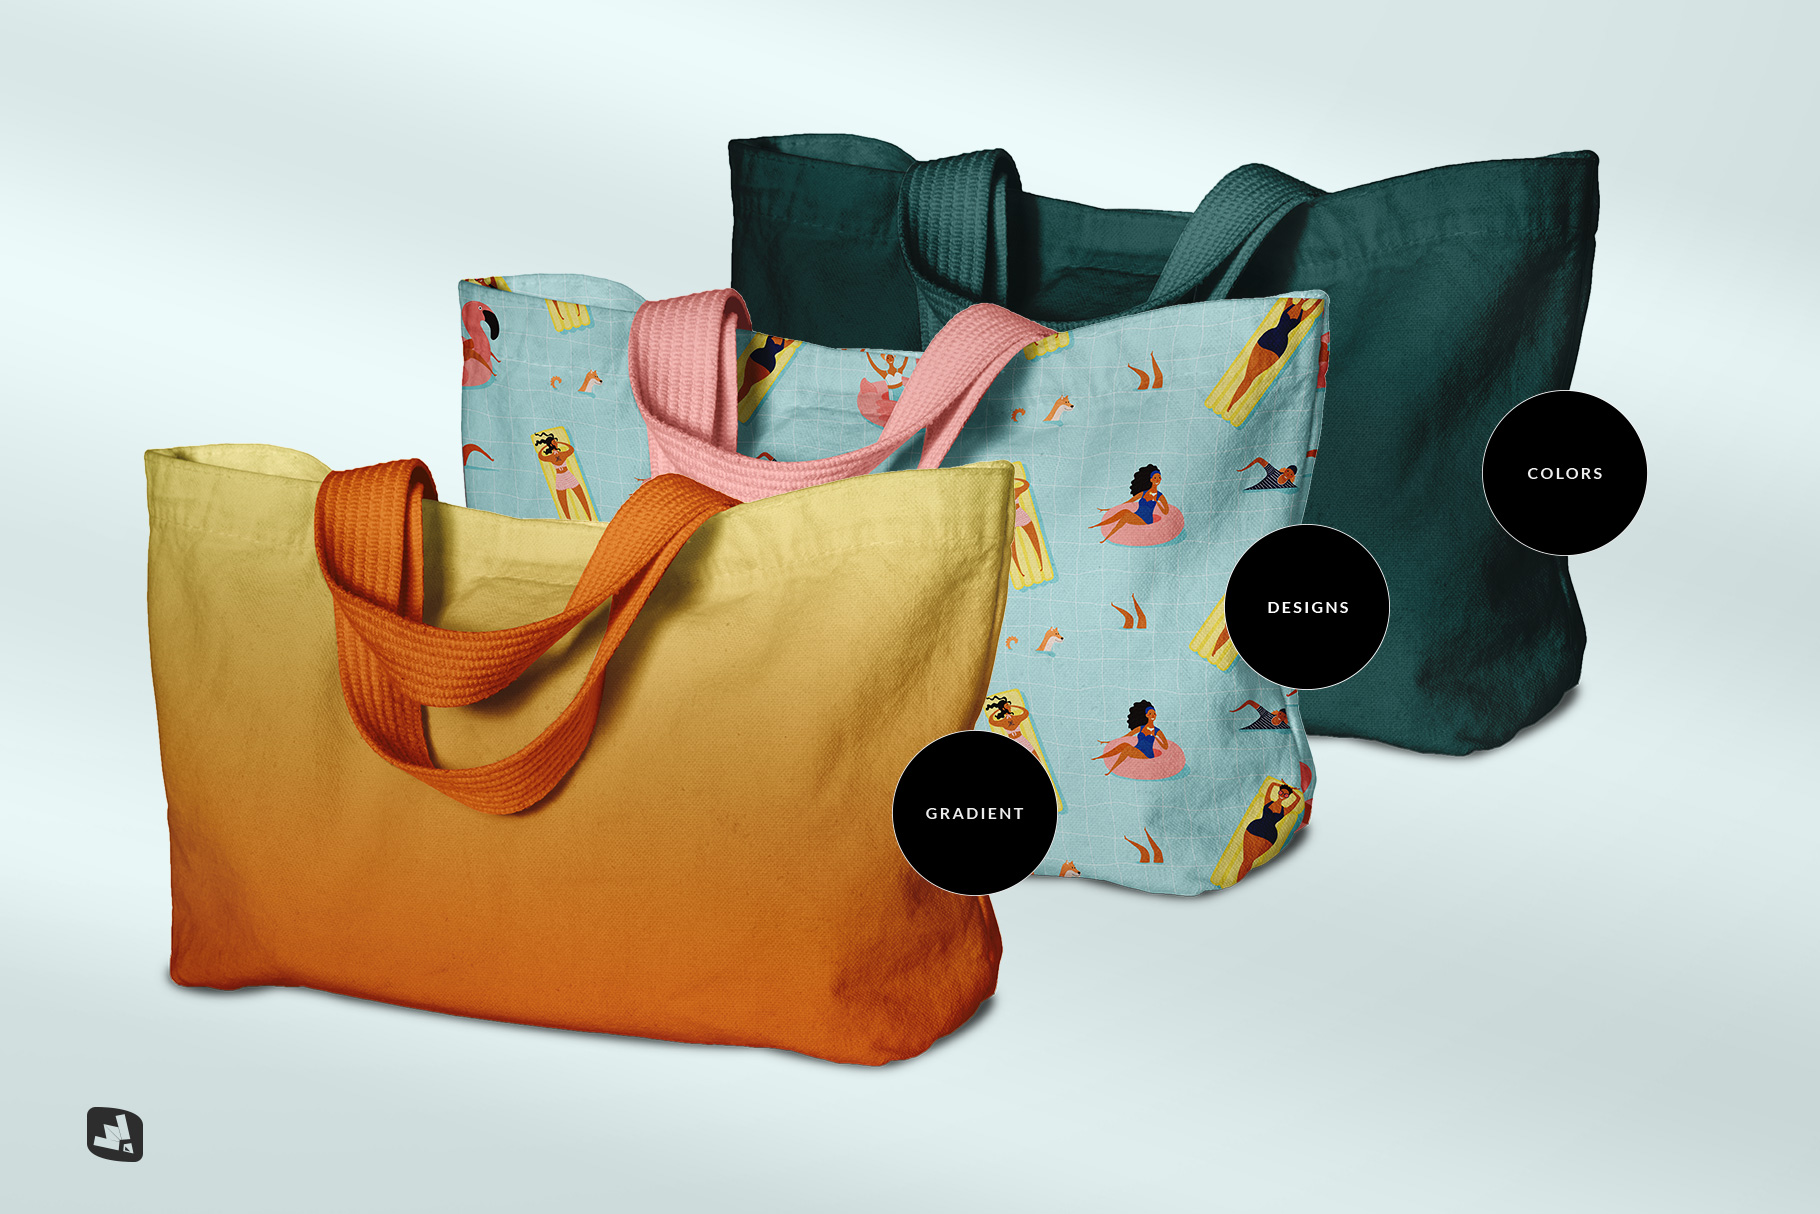 types of the reusable cotton cloth bag mockup